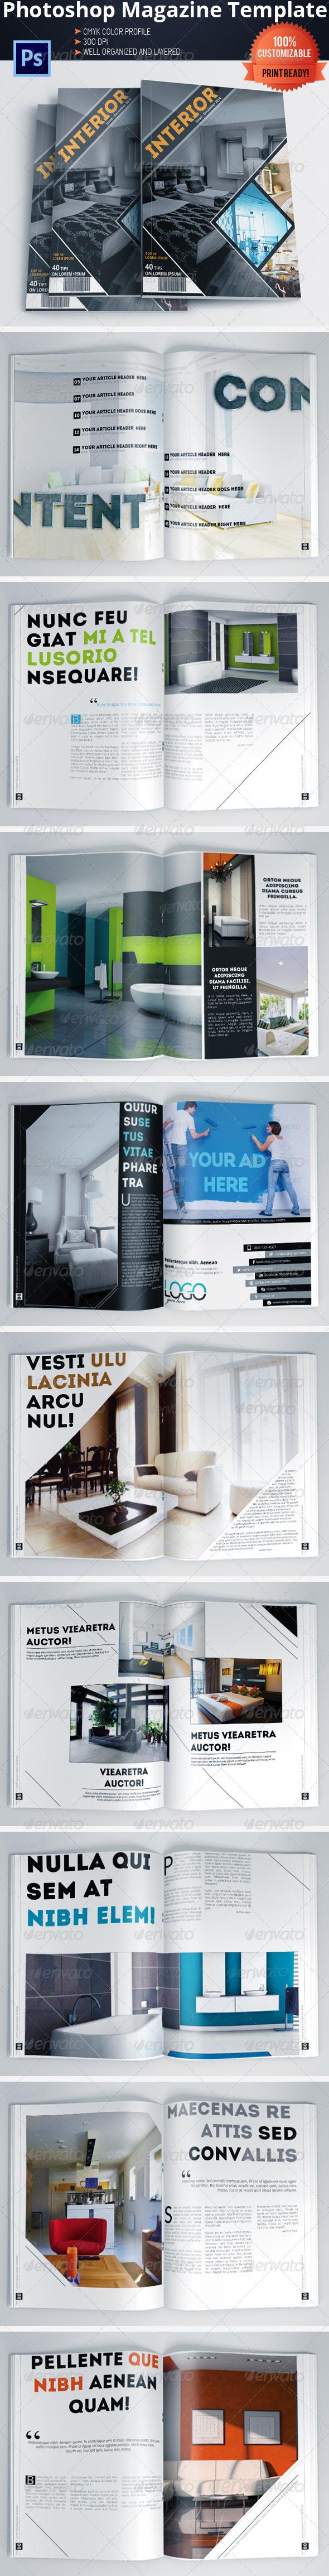 Architecture and Interior Design Magazine/Brochure - Magazines Print Templates